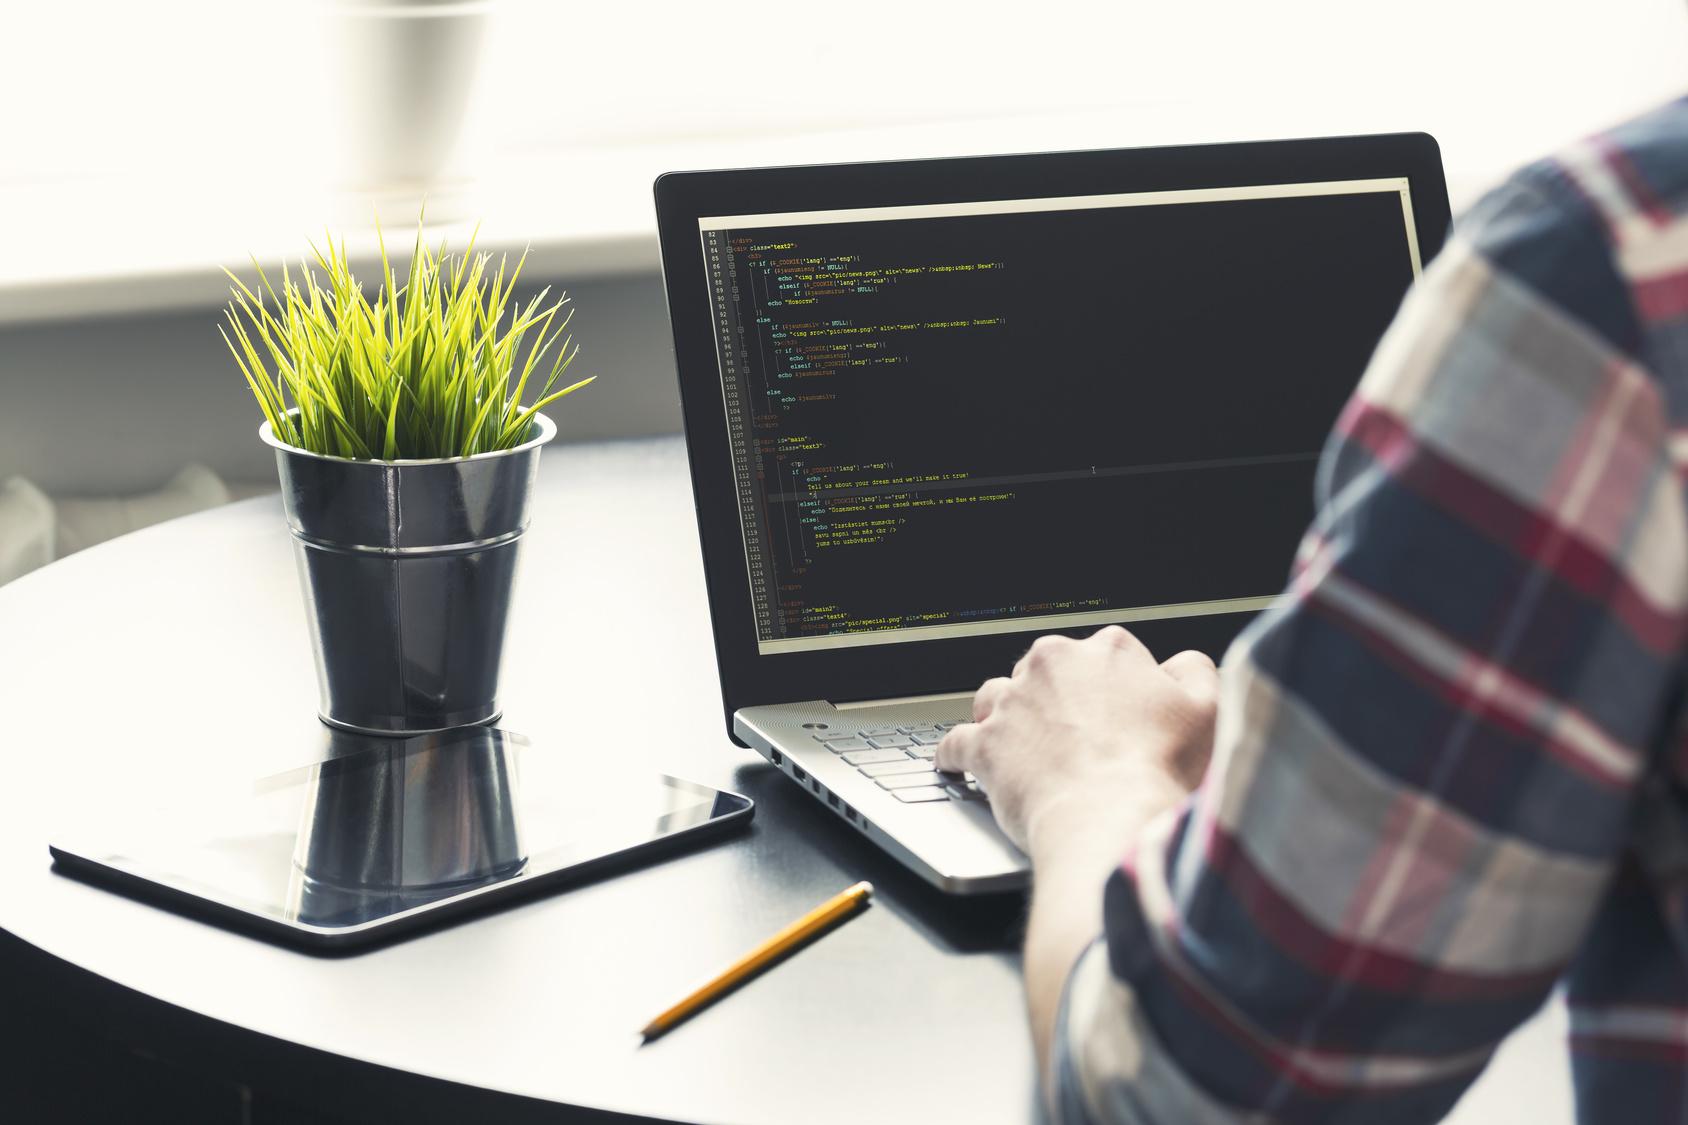 haker programista komputer laptop - fotolia.pl